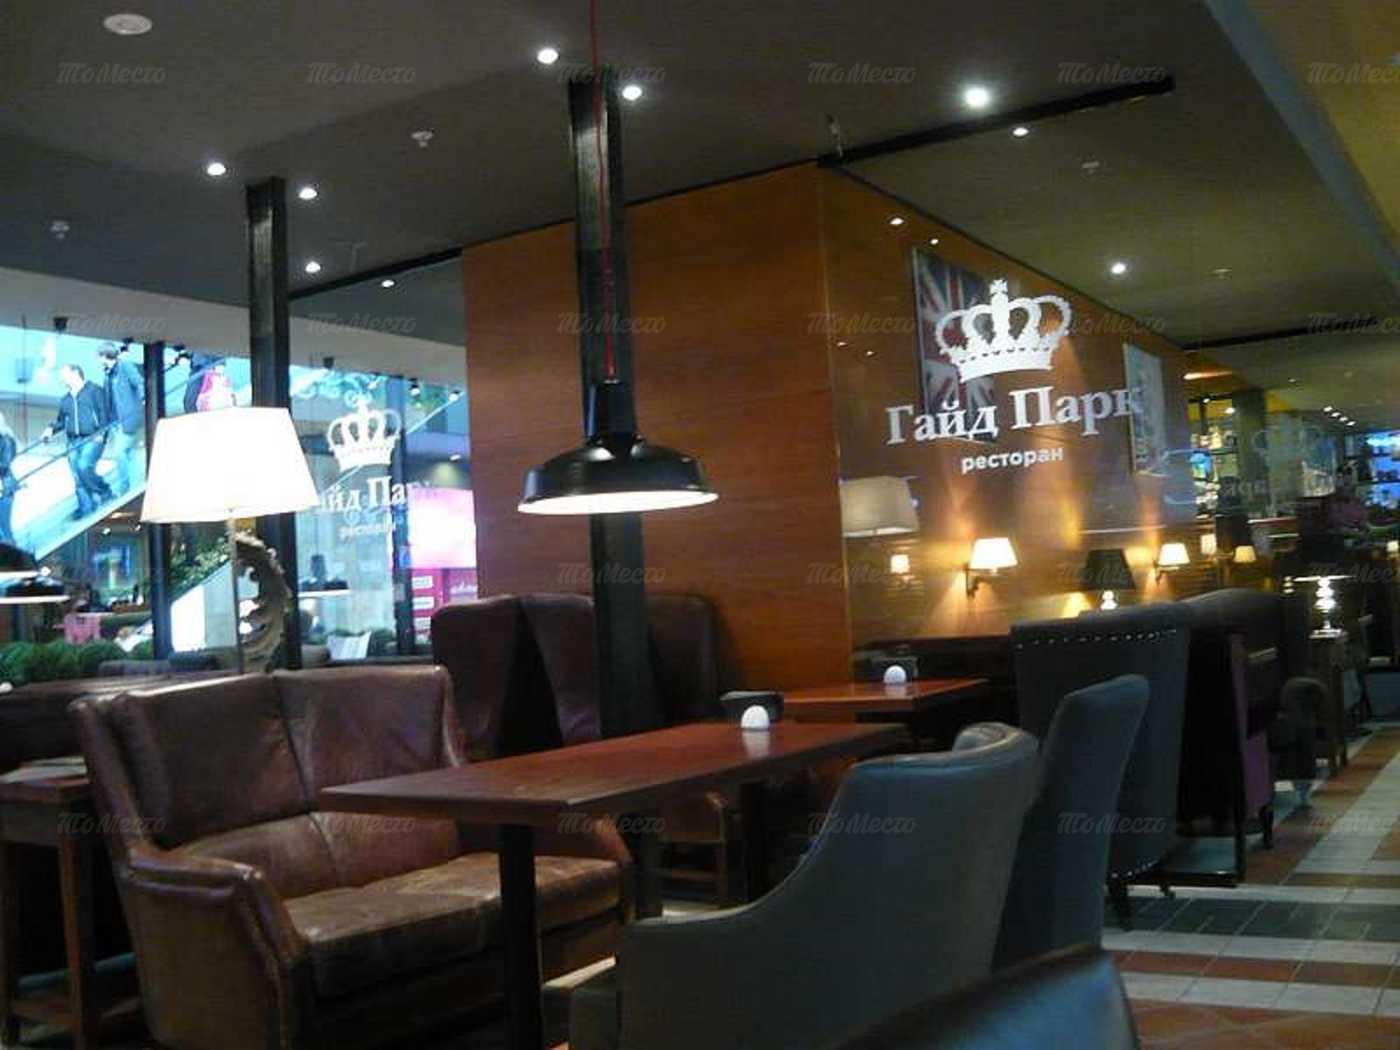 Ресторан Гайд парк на проспекте Михаила Нагибина фото 2